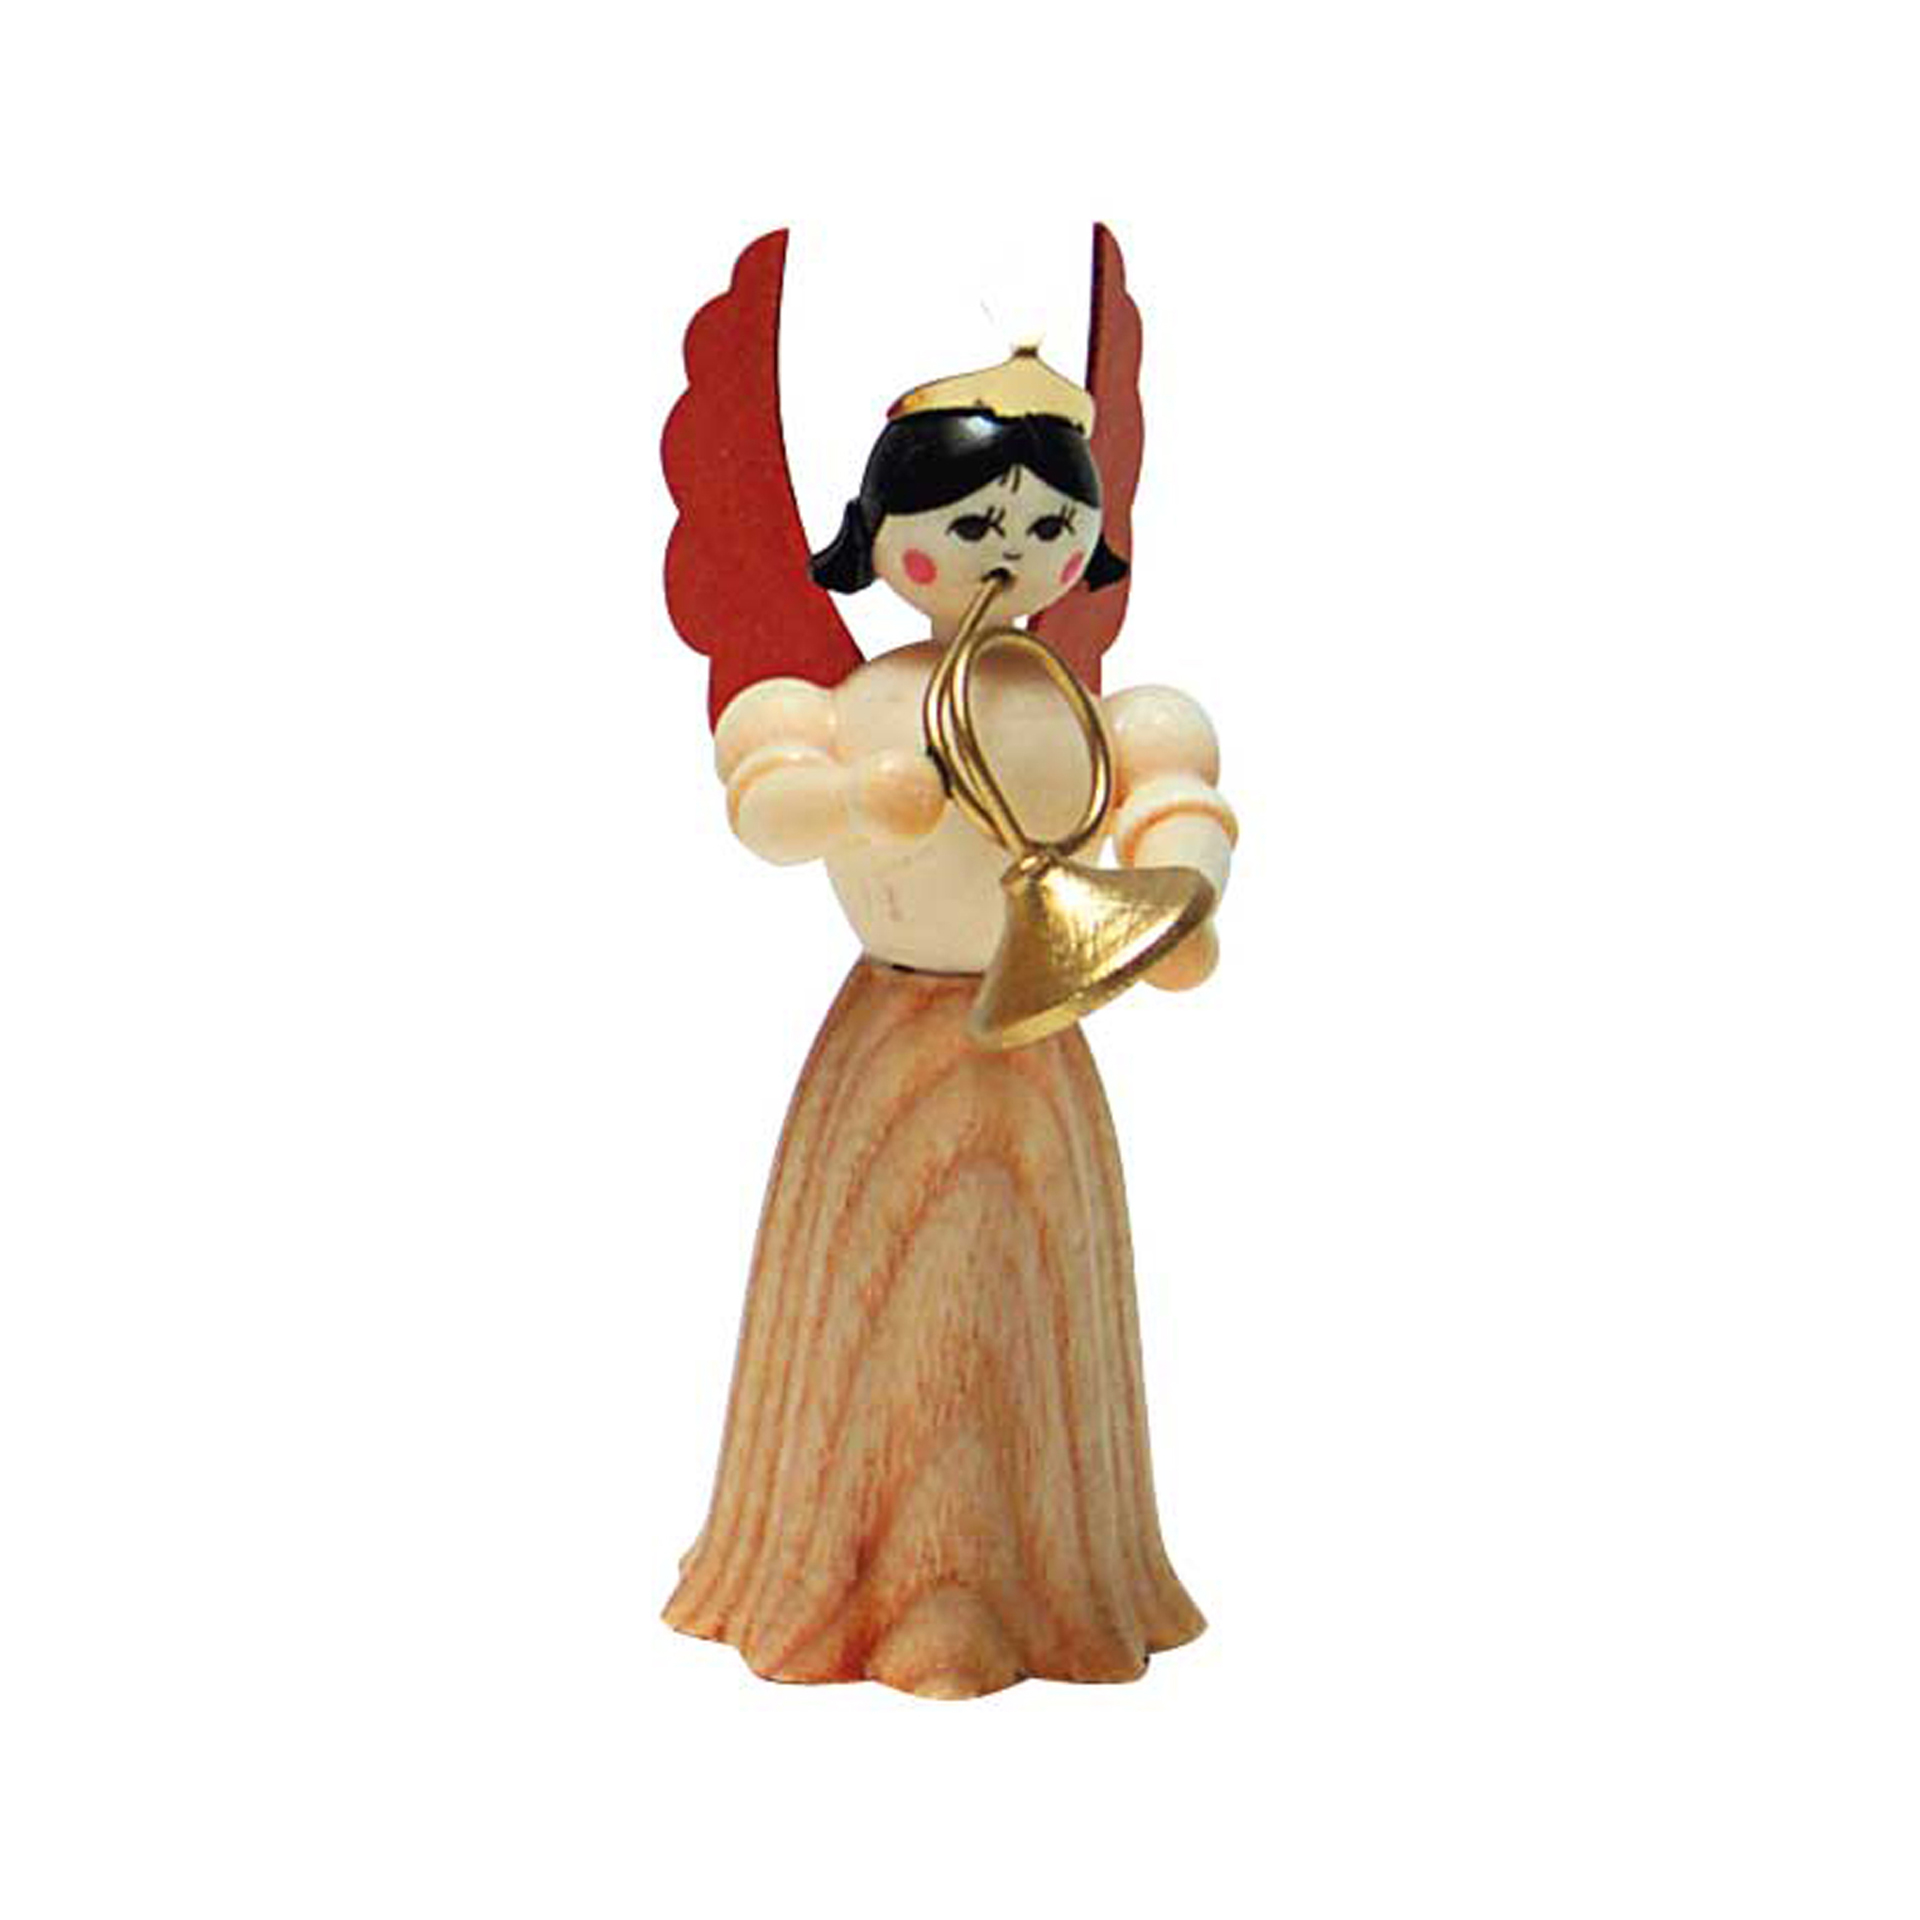 Engel mit Waldhorn, 7cm